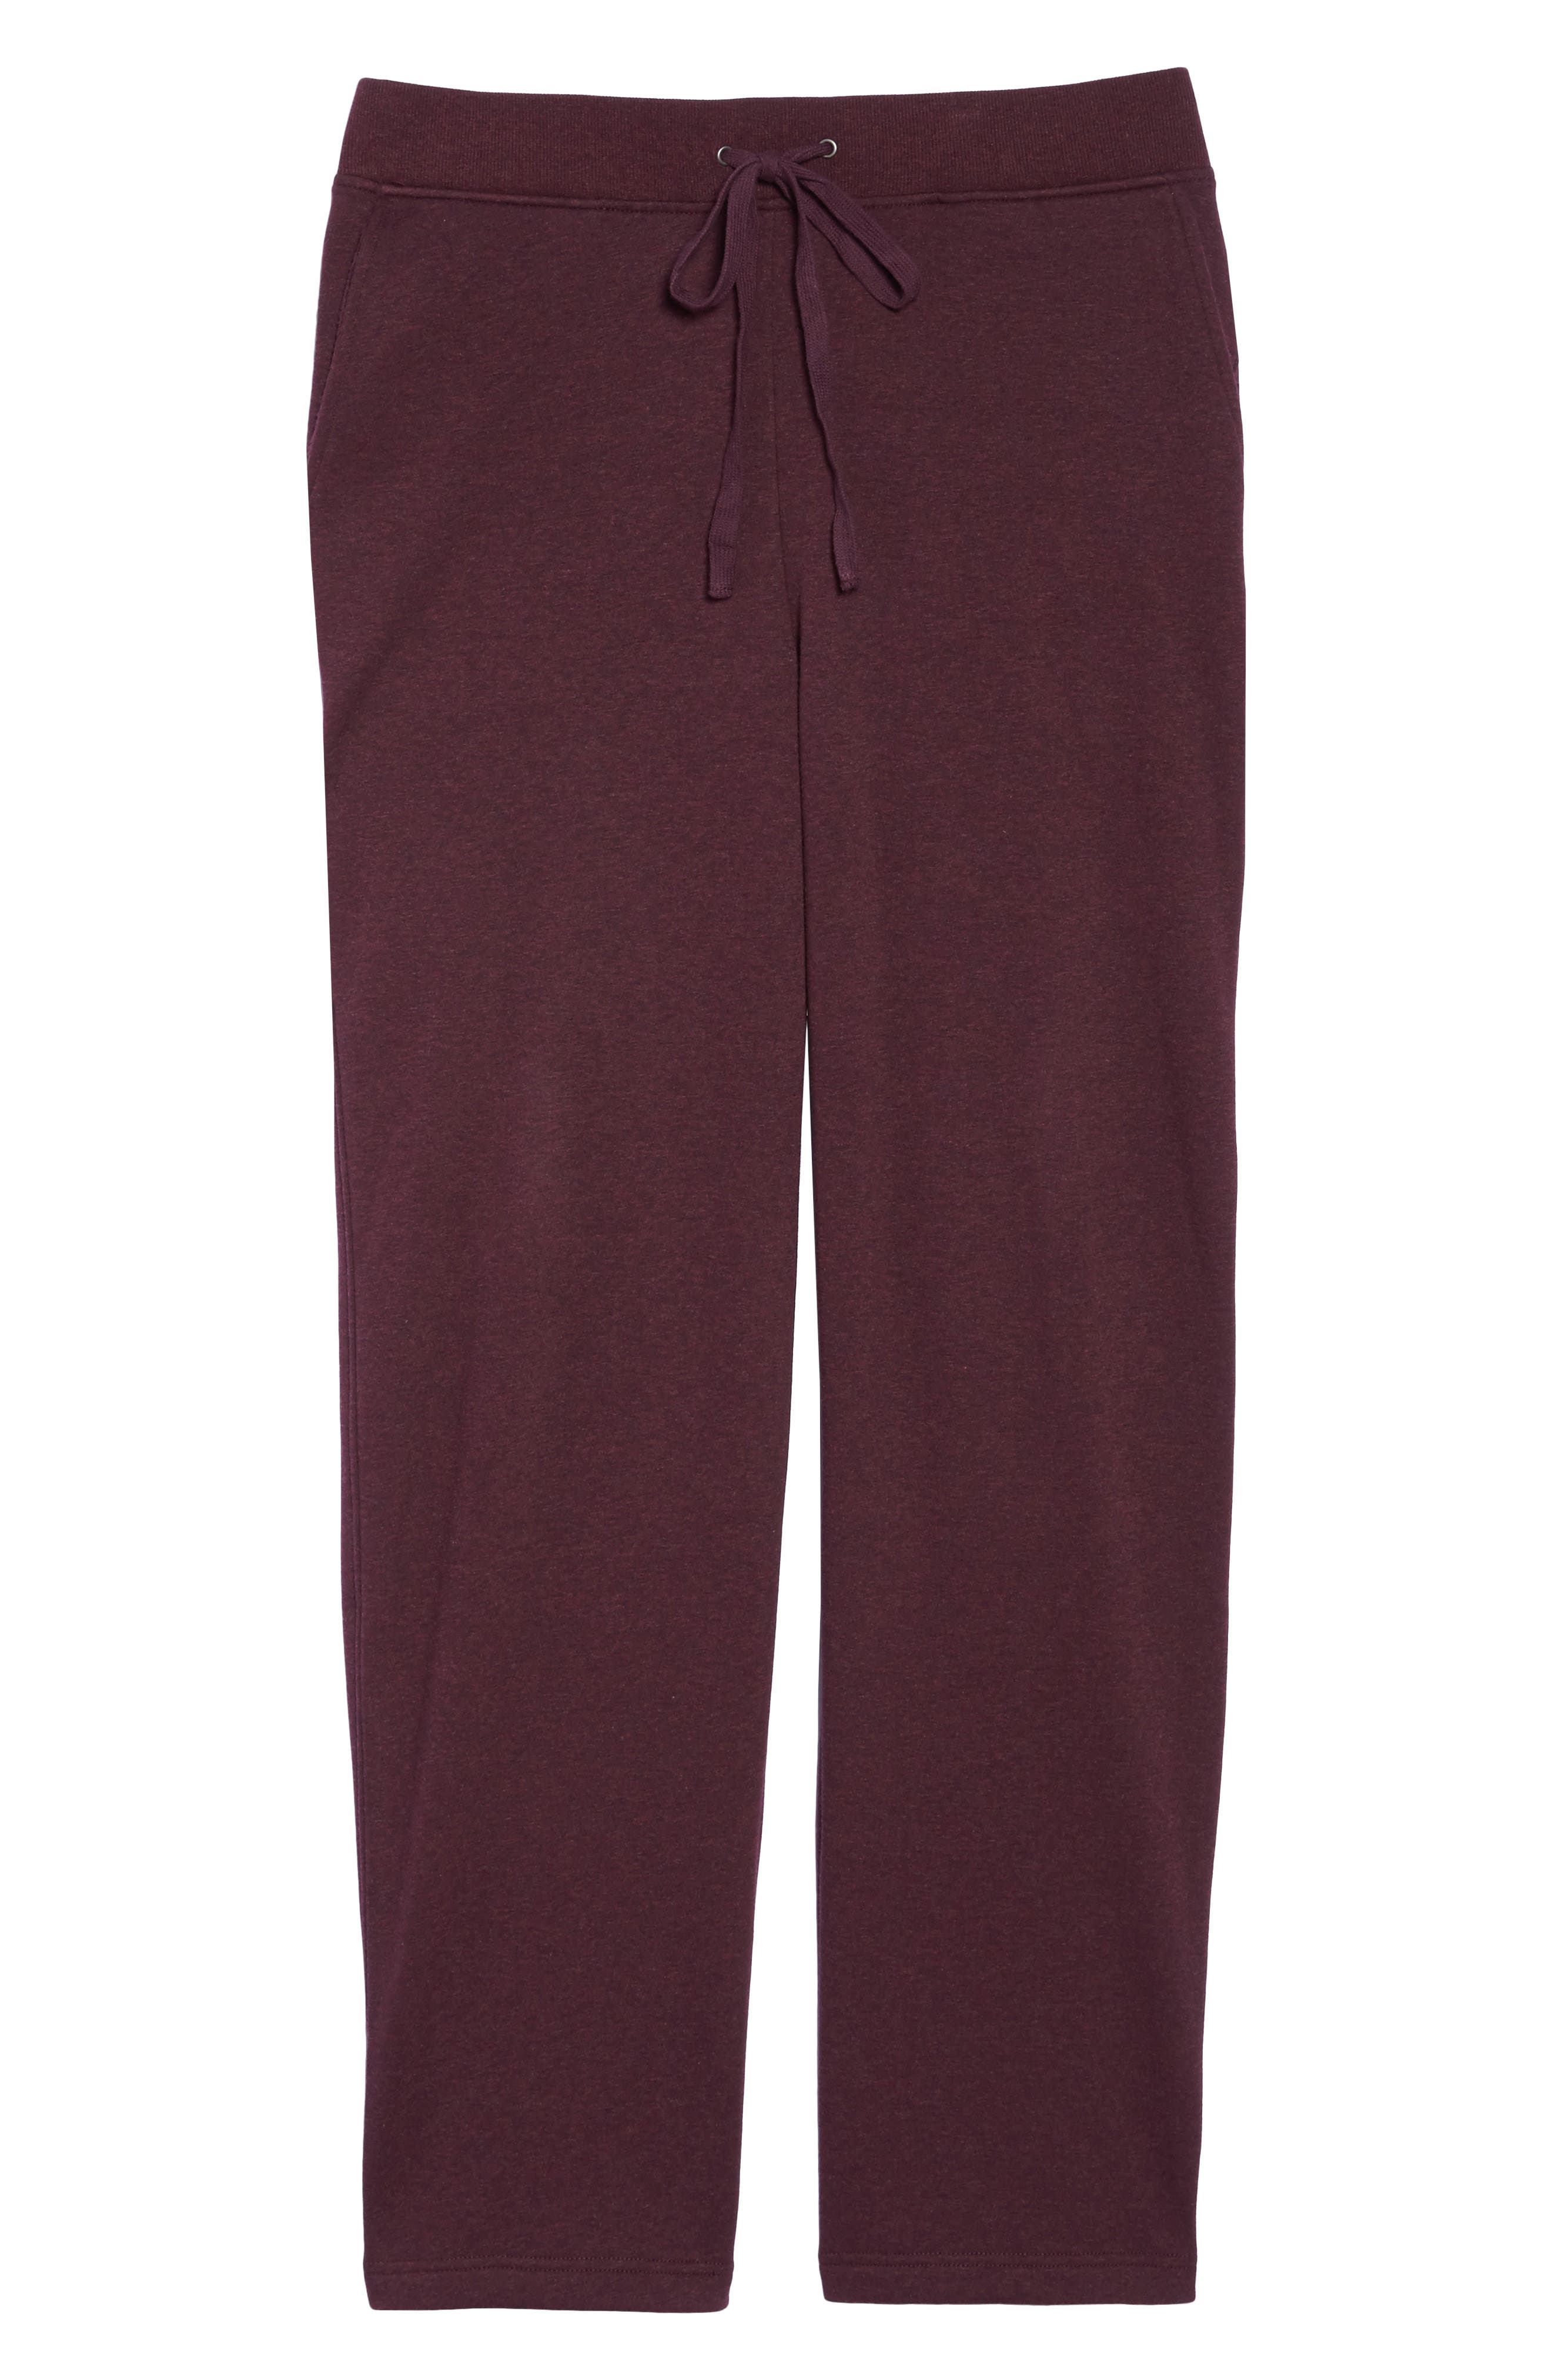 Alternate Image 4  - UGG® Penny Fleece Sweatpants (Plus Size)